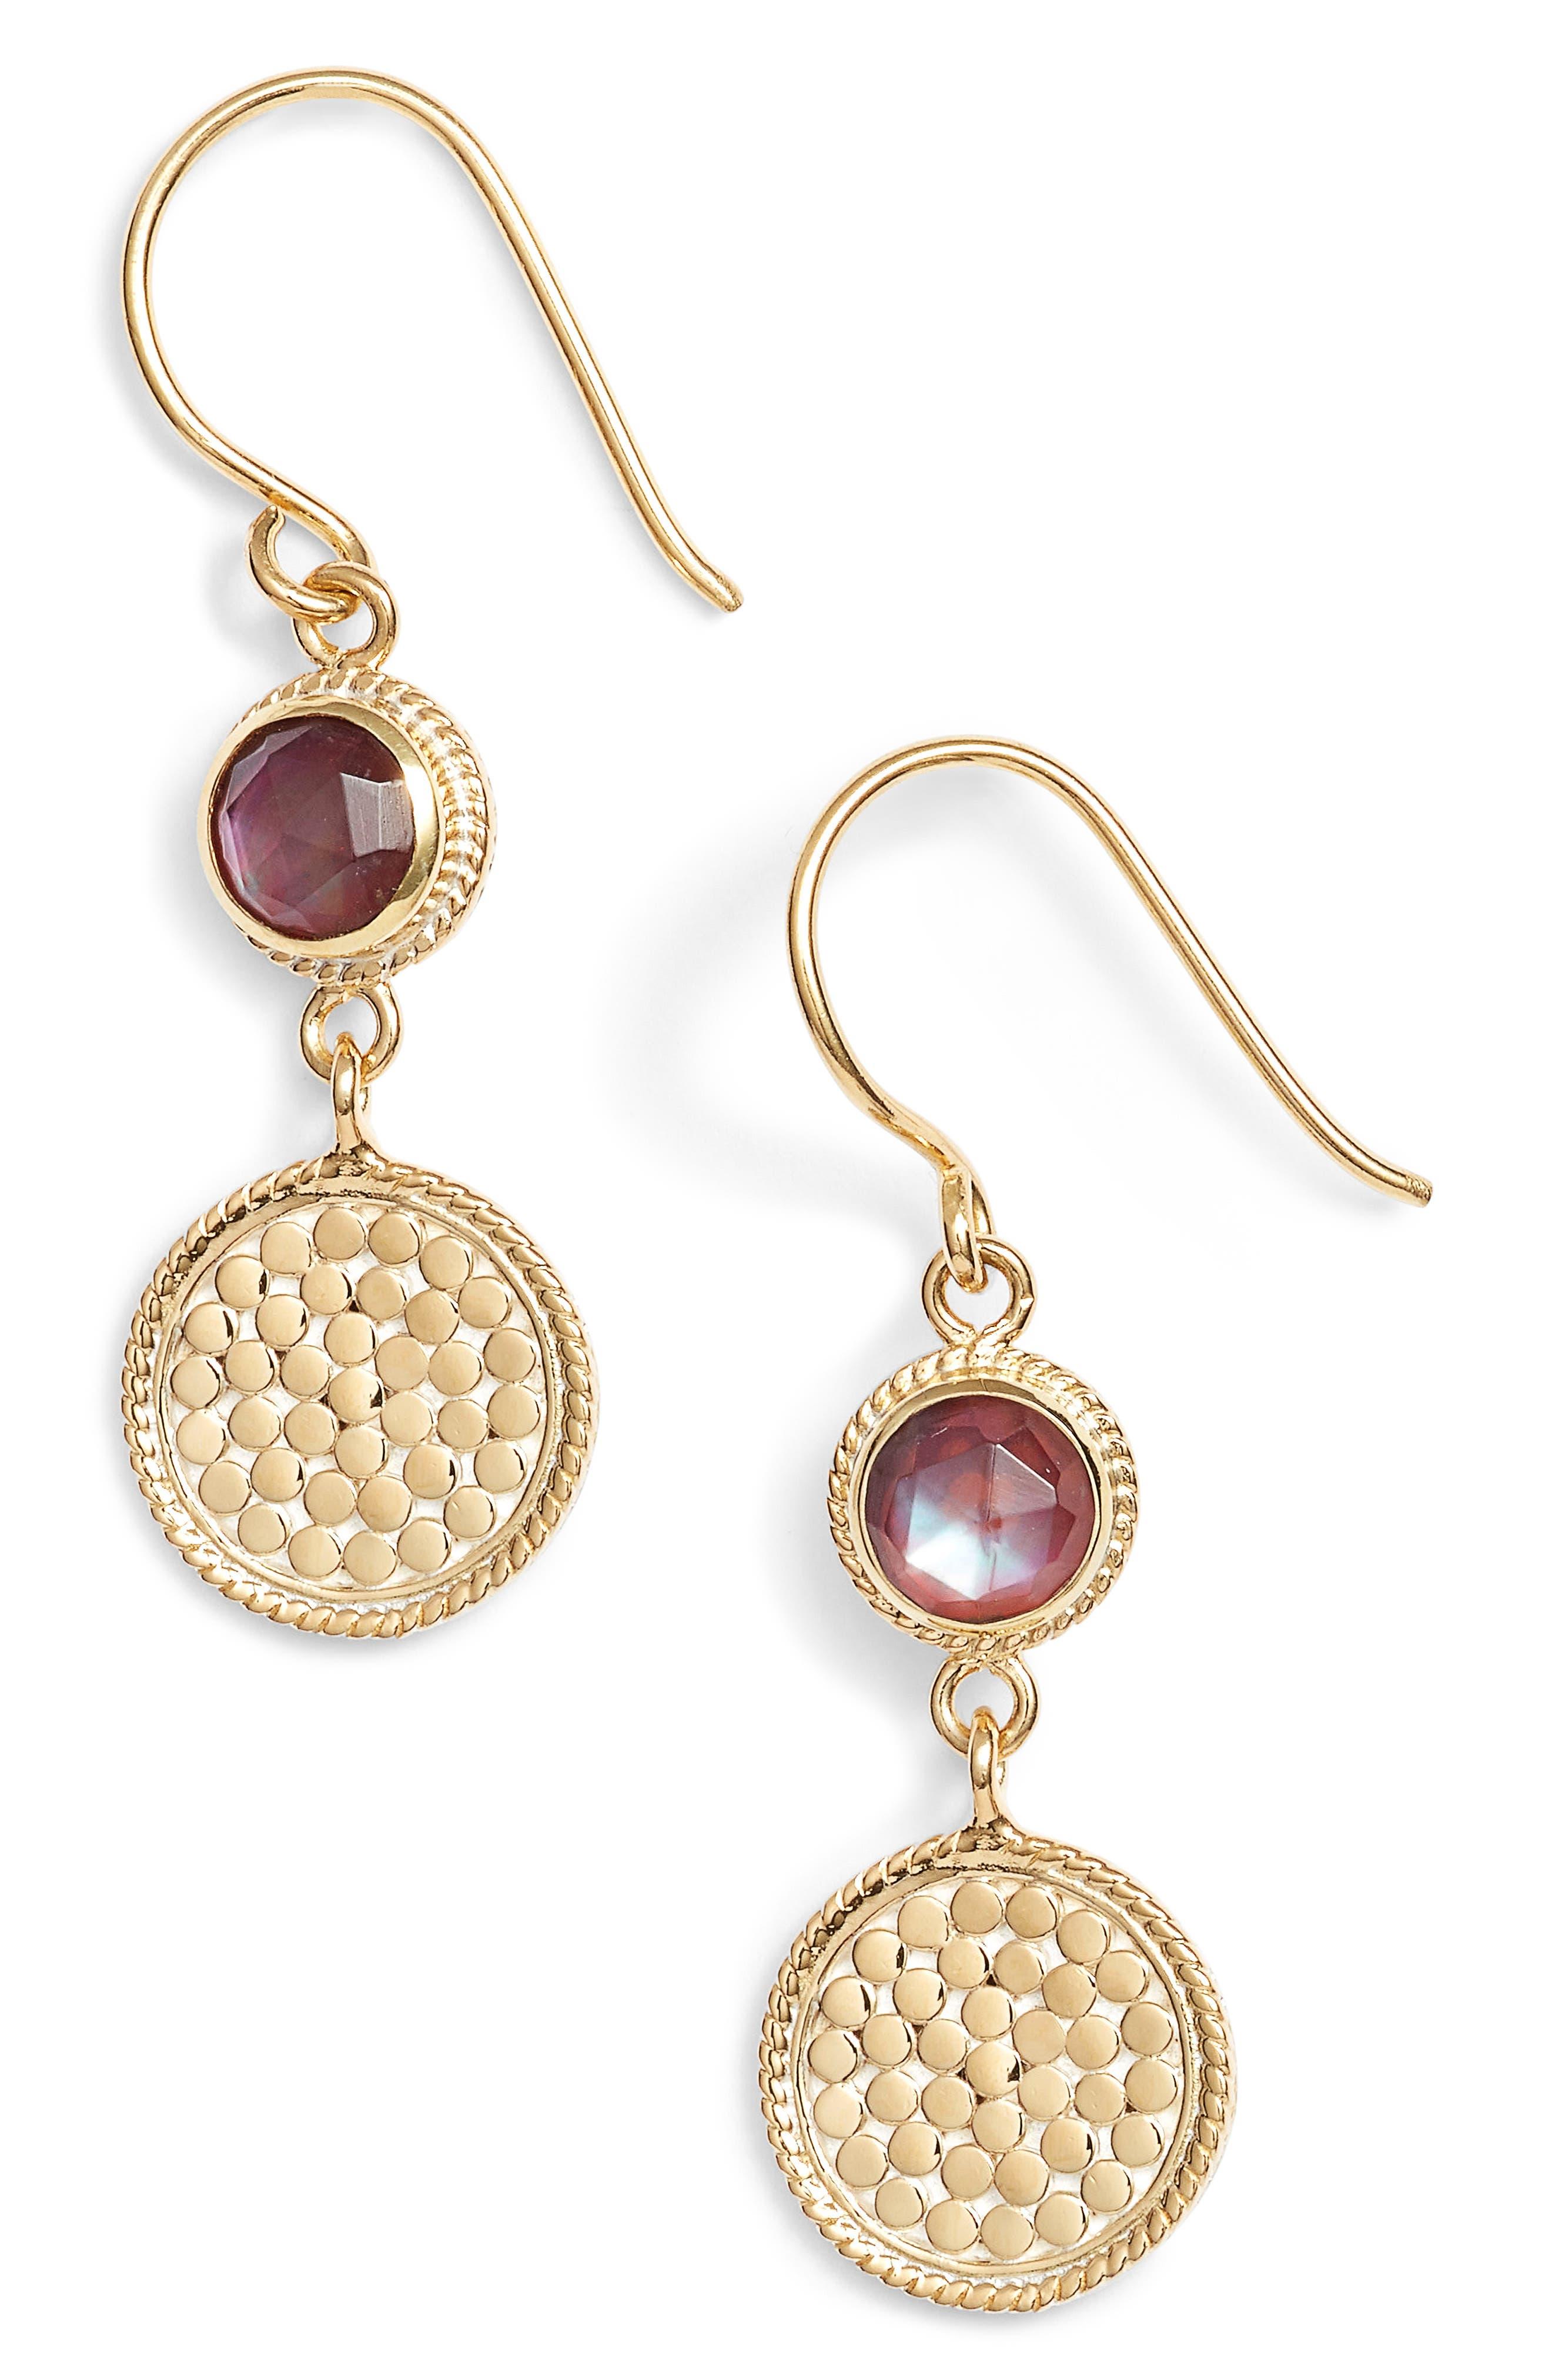 Semiprecious Stone Double Drop Earrings,                         Main,                         color, Gold/ Silver/ Garnet